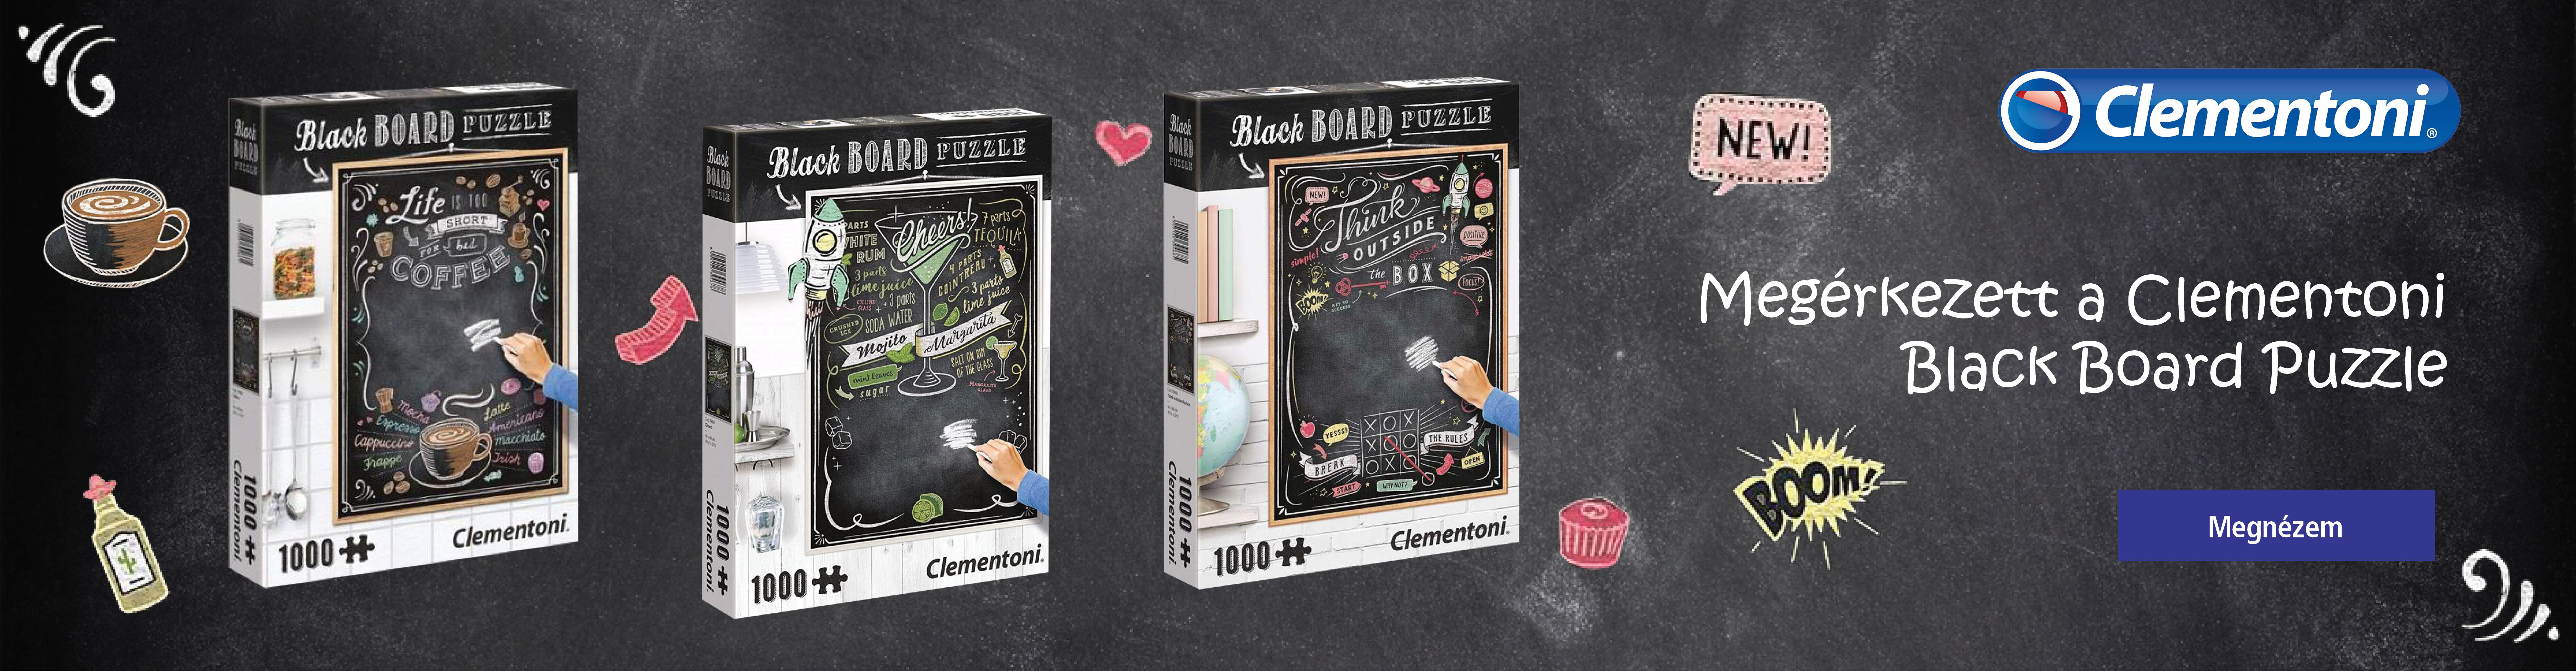 Clementoni Black Board